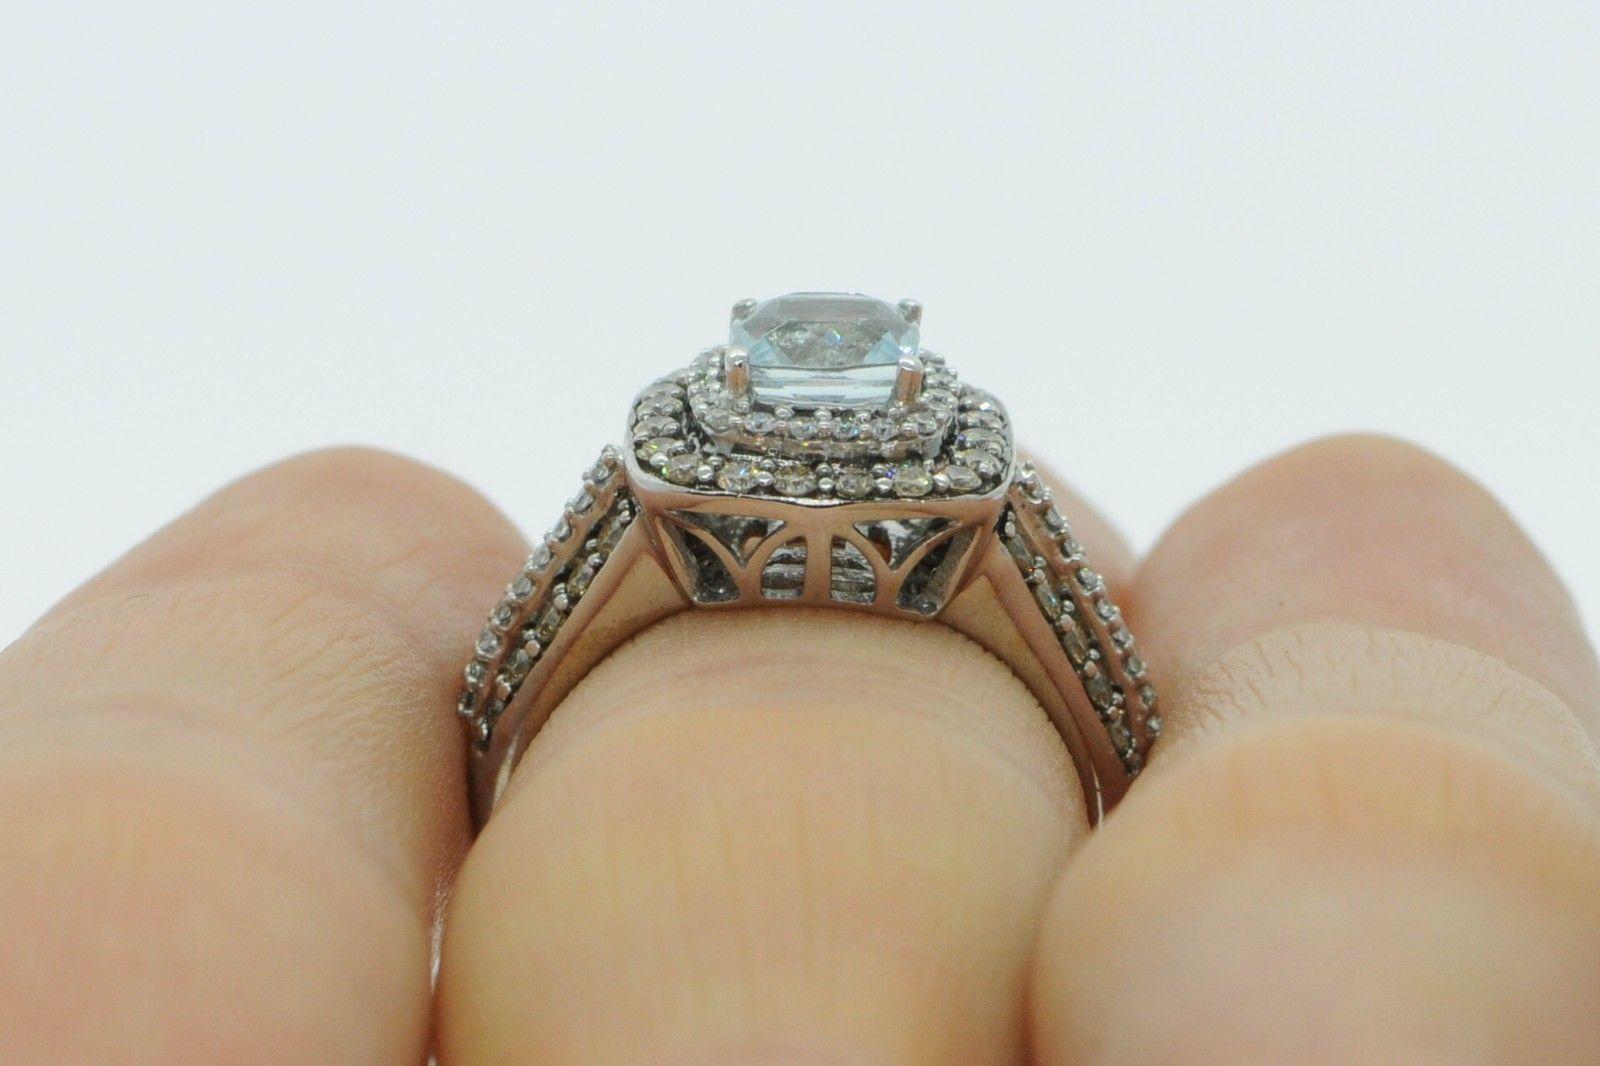 LEVIAN 14K White Gold Aquamarine Ring w/ Chocolate and Vanilla Diamonds SZ 6.75